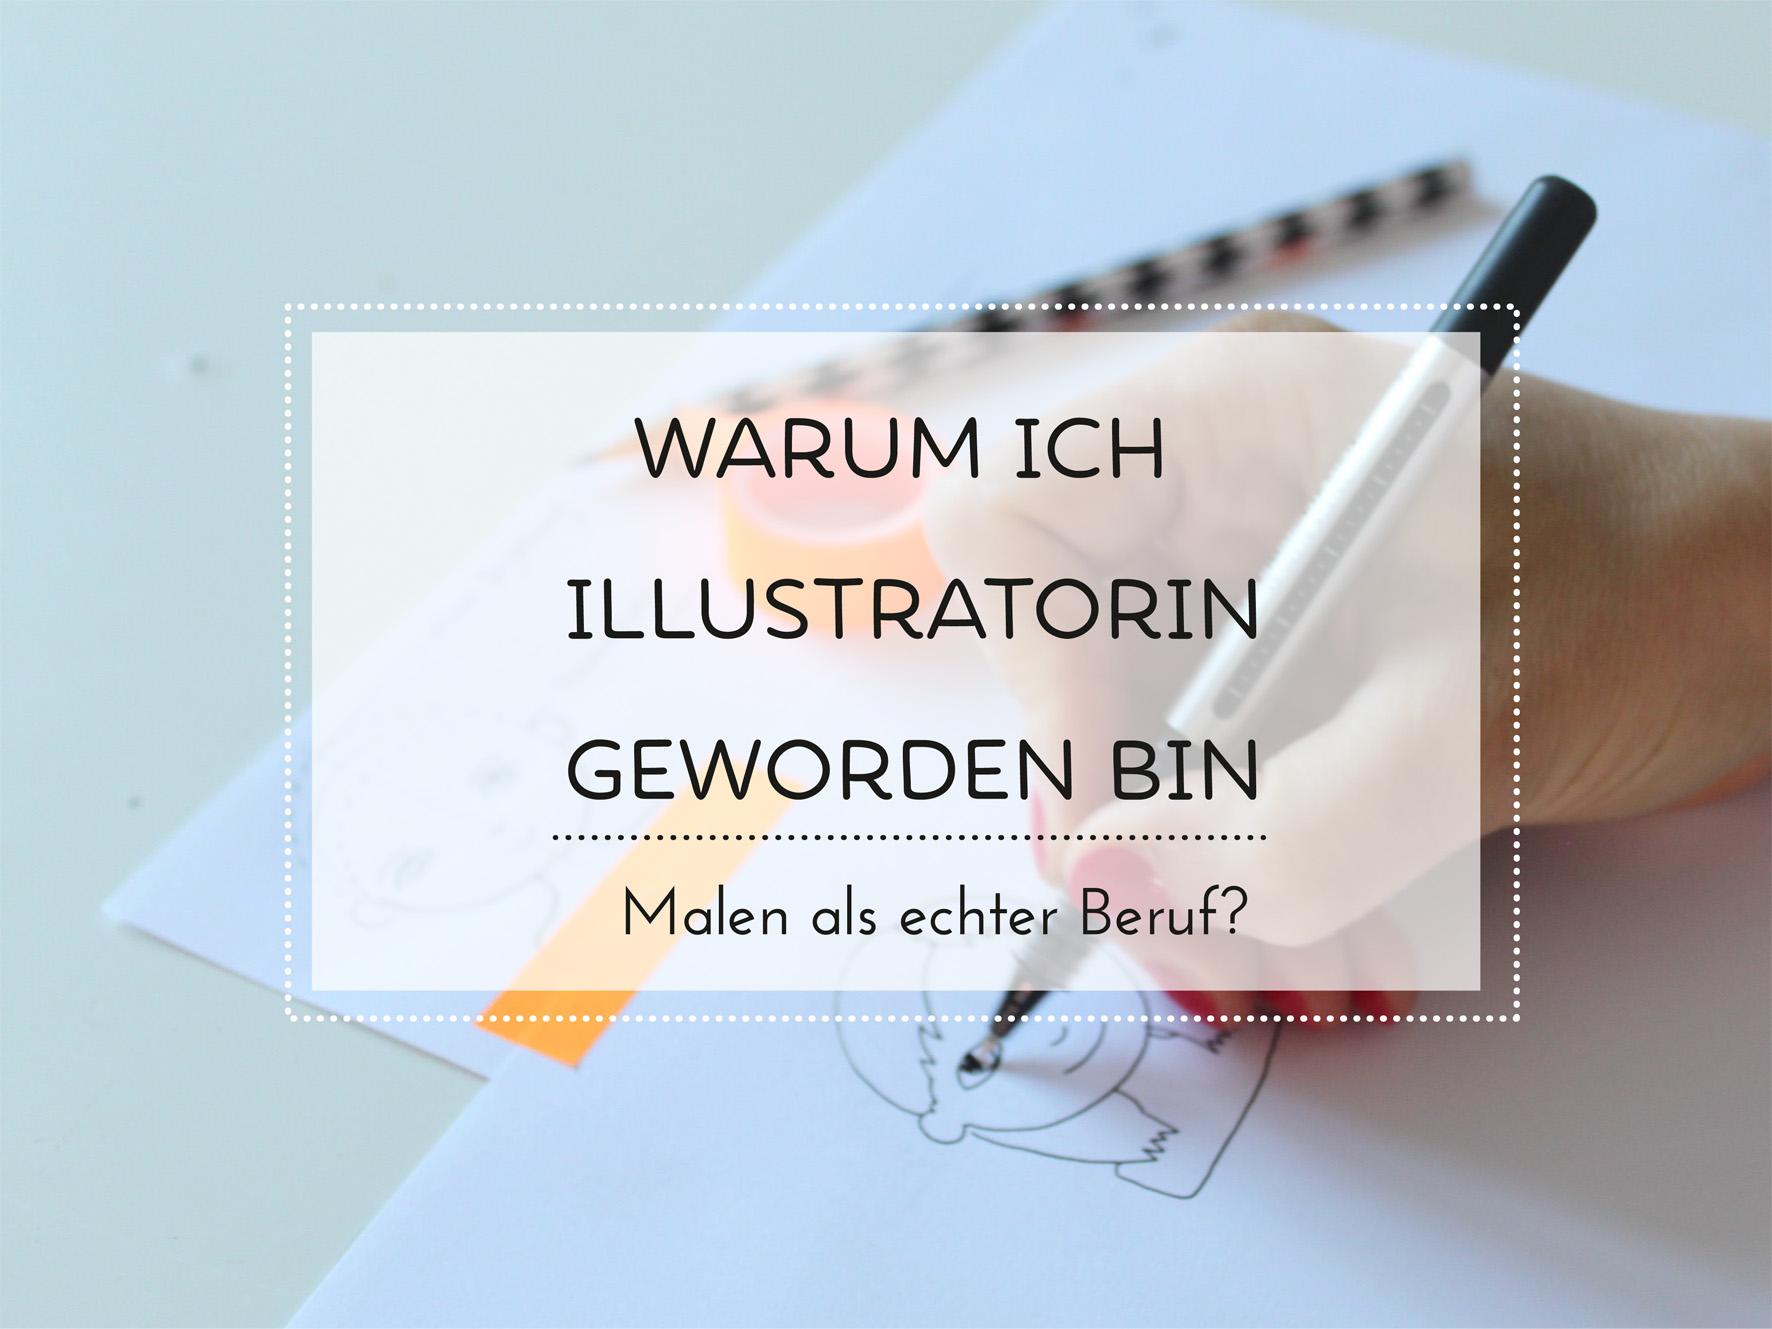 warum_illustratorin.jpg